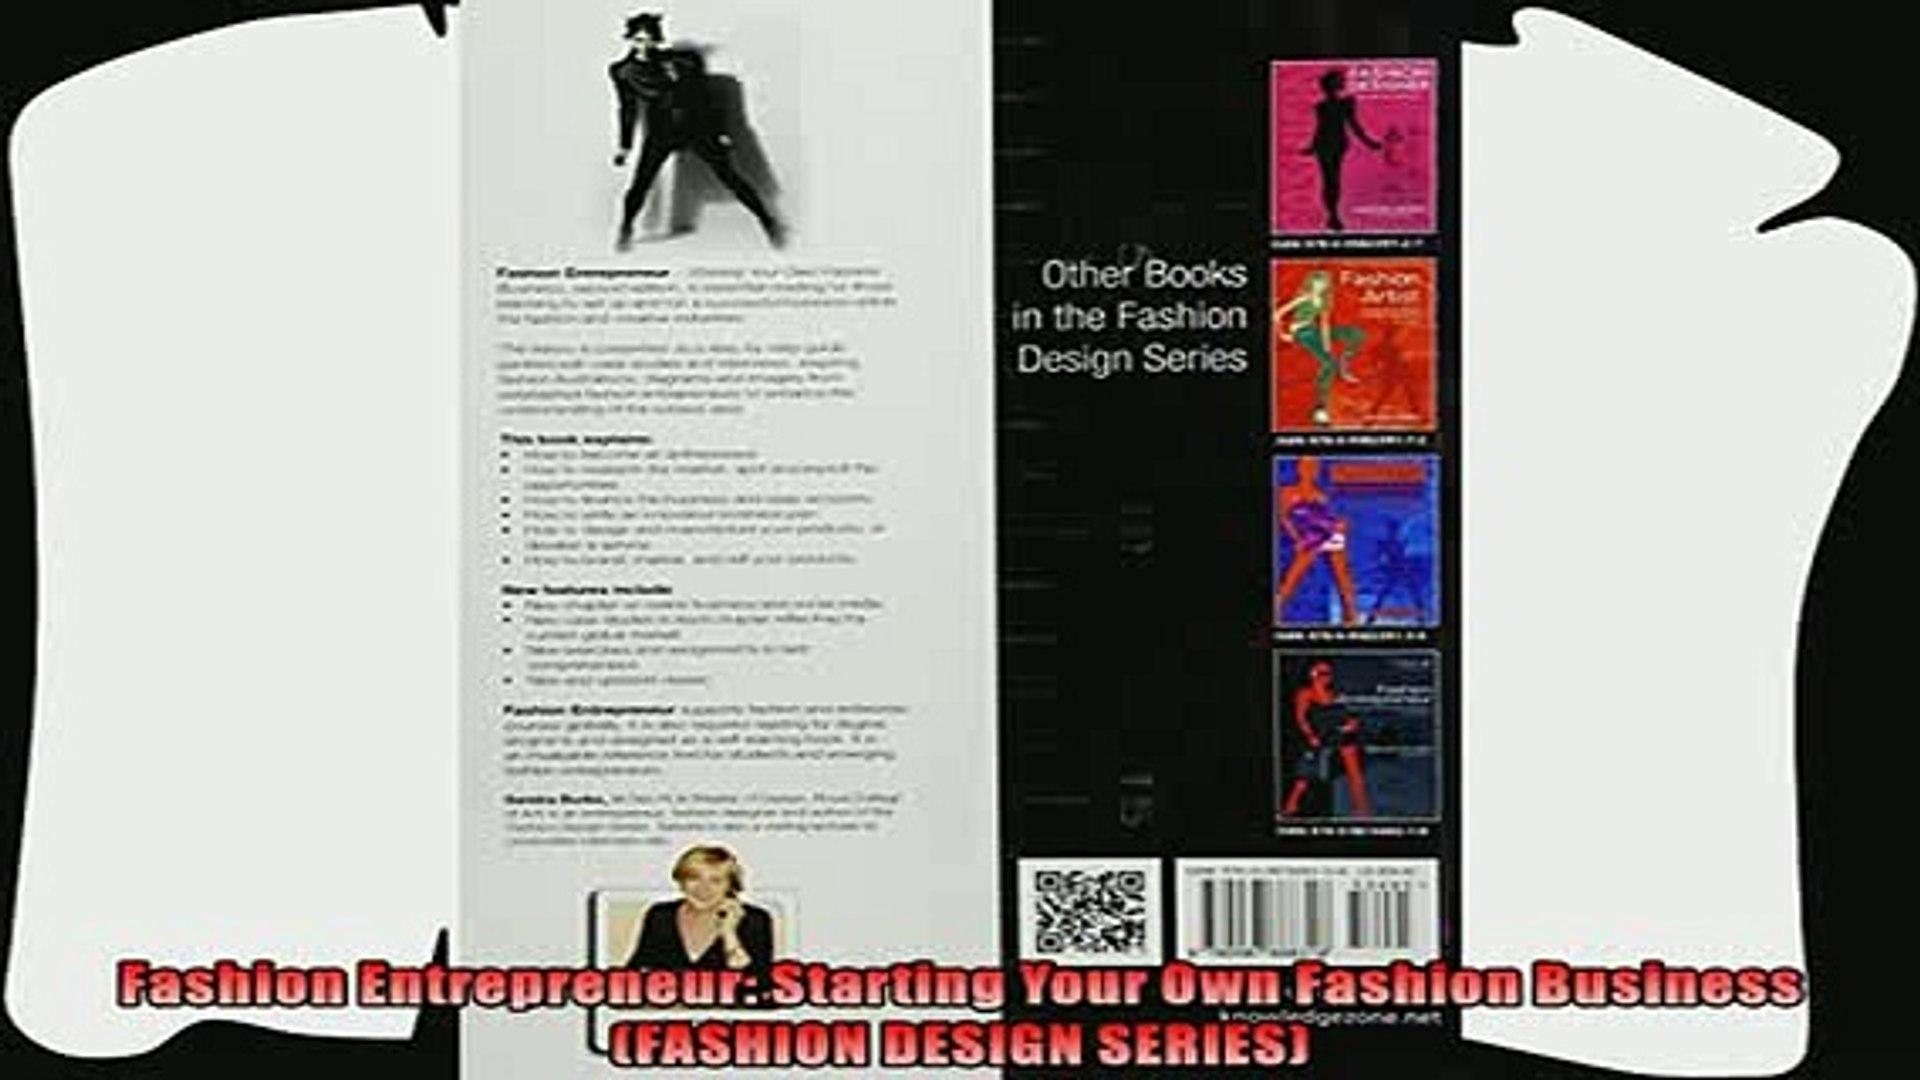 book online   Fashion Entrepreneur Starting Your Own Fashion Business FASHION DESIGN SERIES